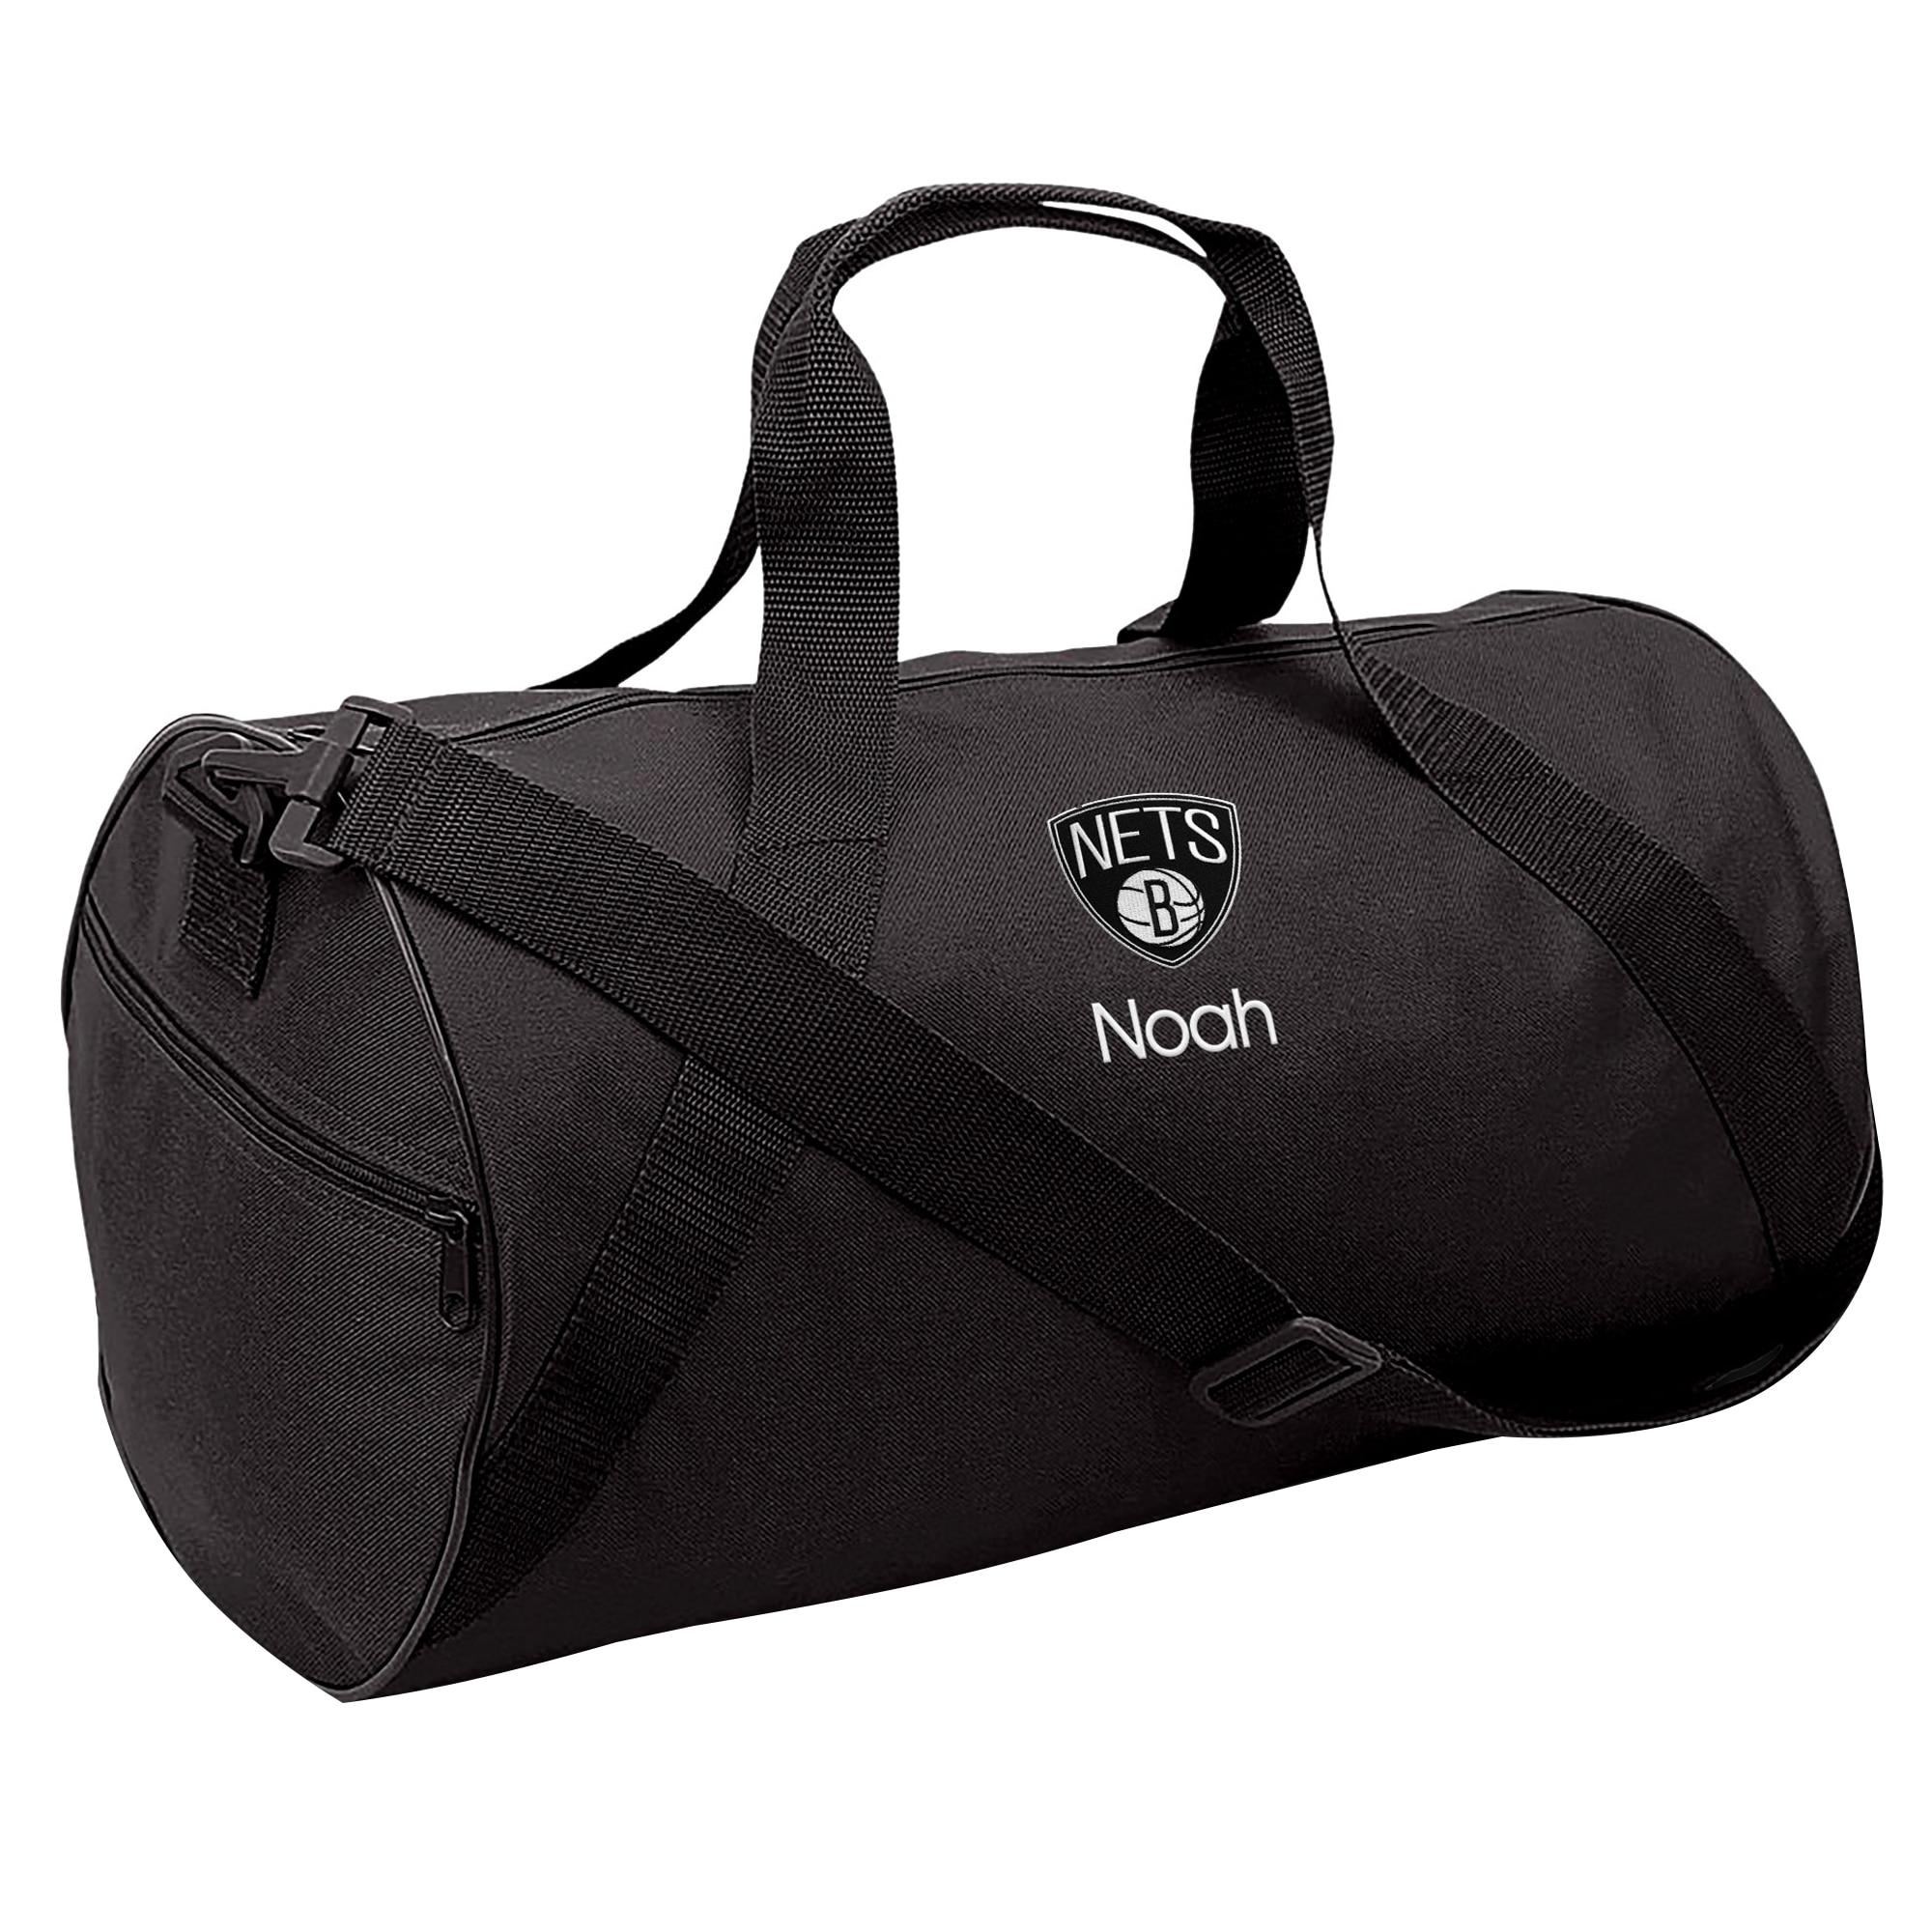 Brooklyn Nets Youth Personalized Duffle Bag - Black